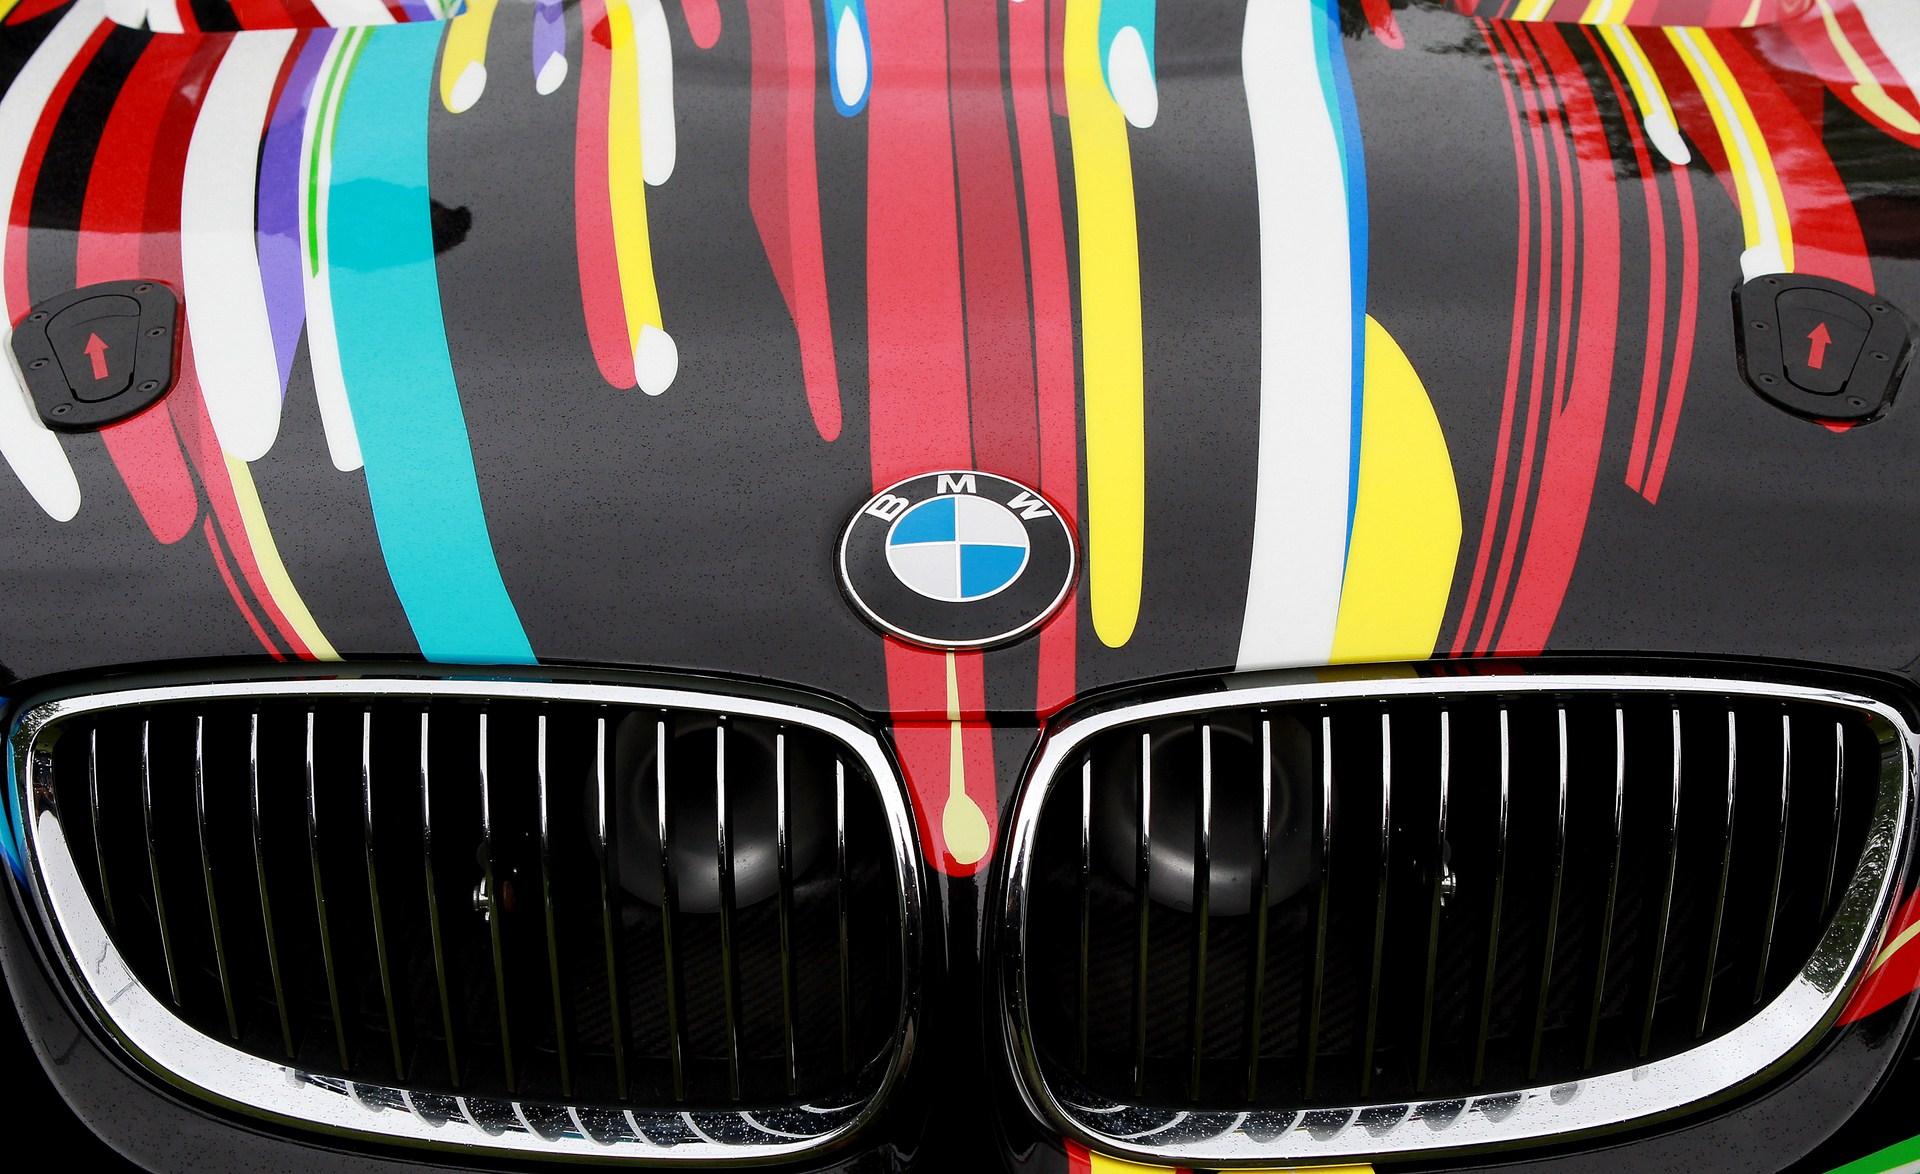 bmw art cars london 01